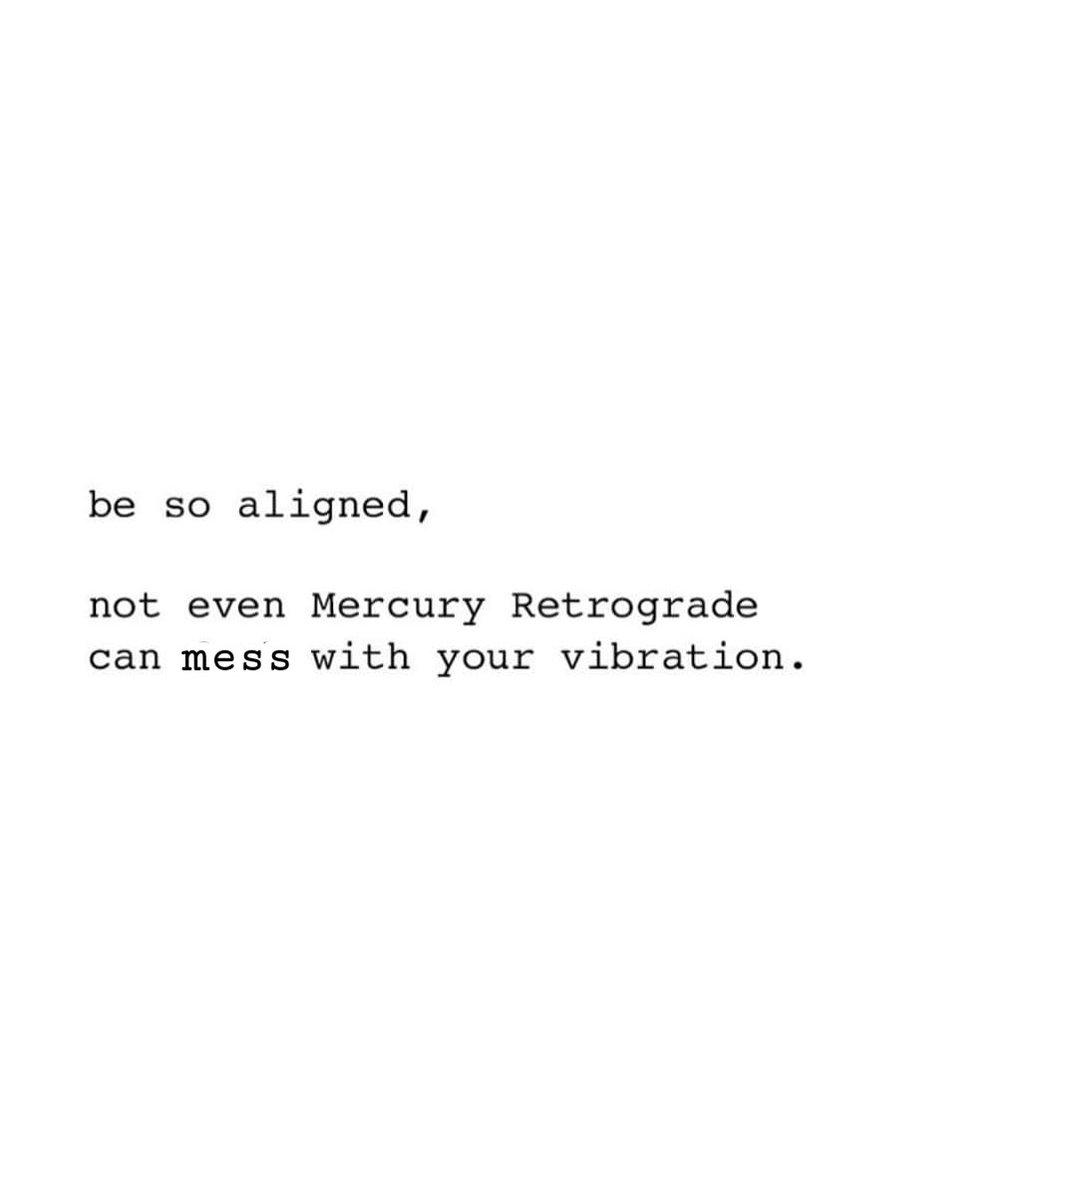 Mercury retrograde starts today till March 9th.. enjoy the ride 😛